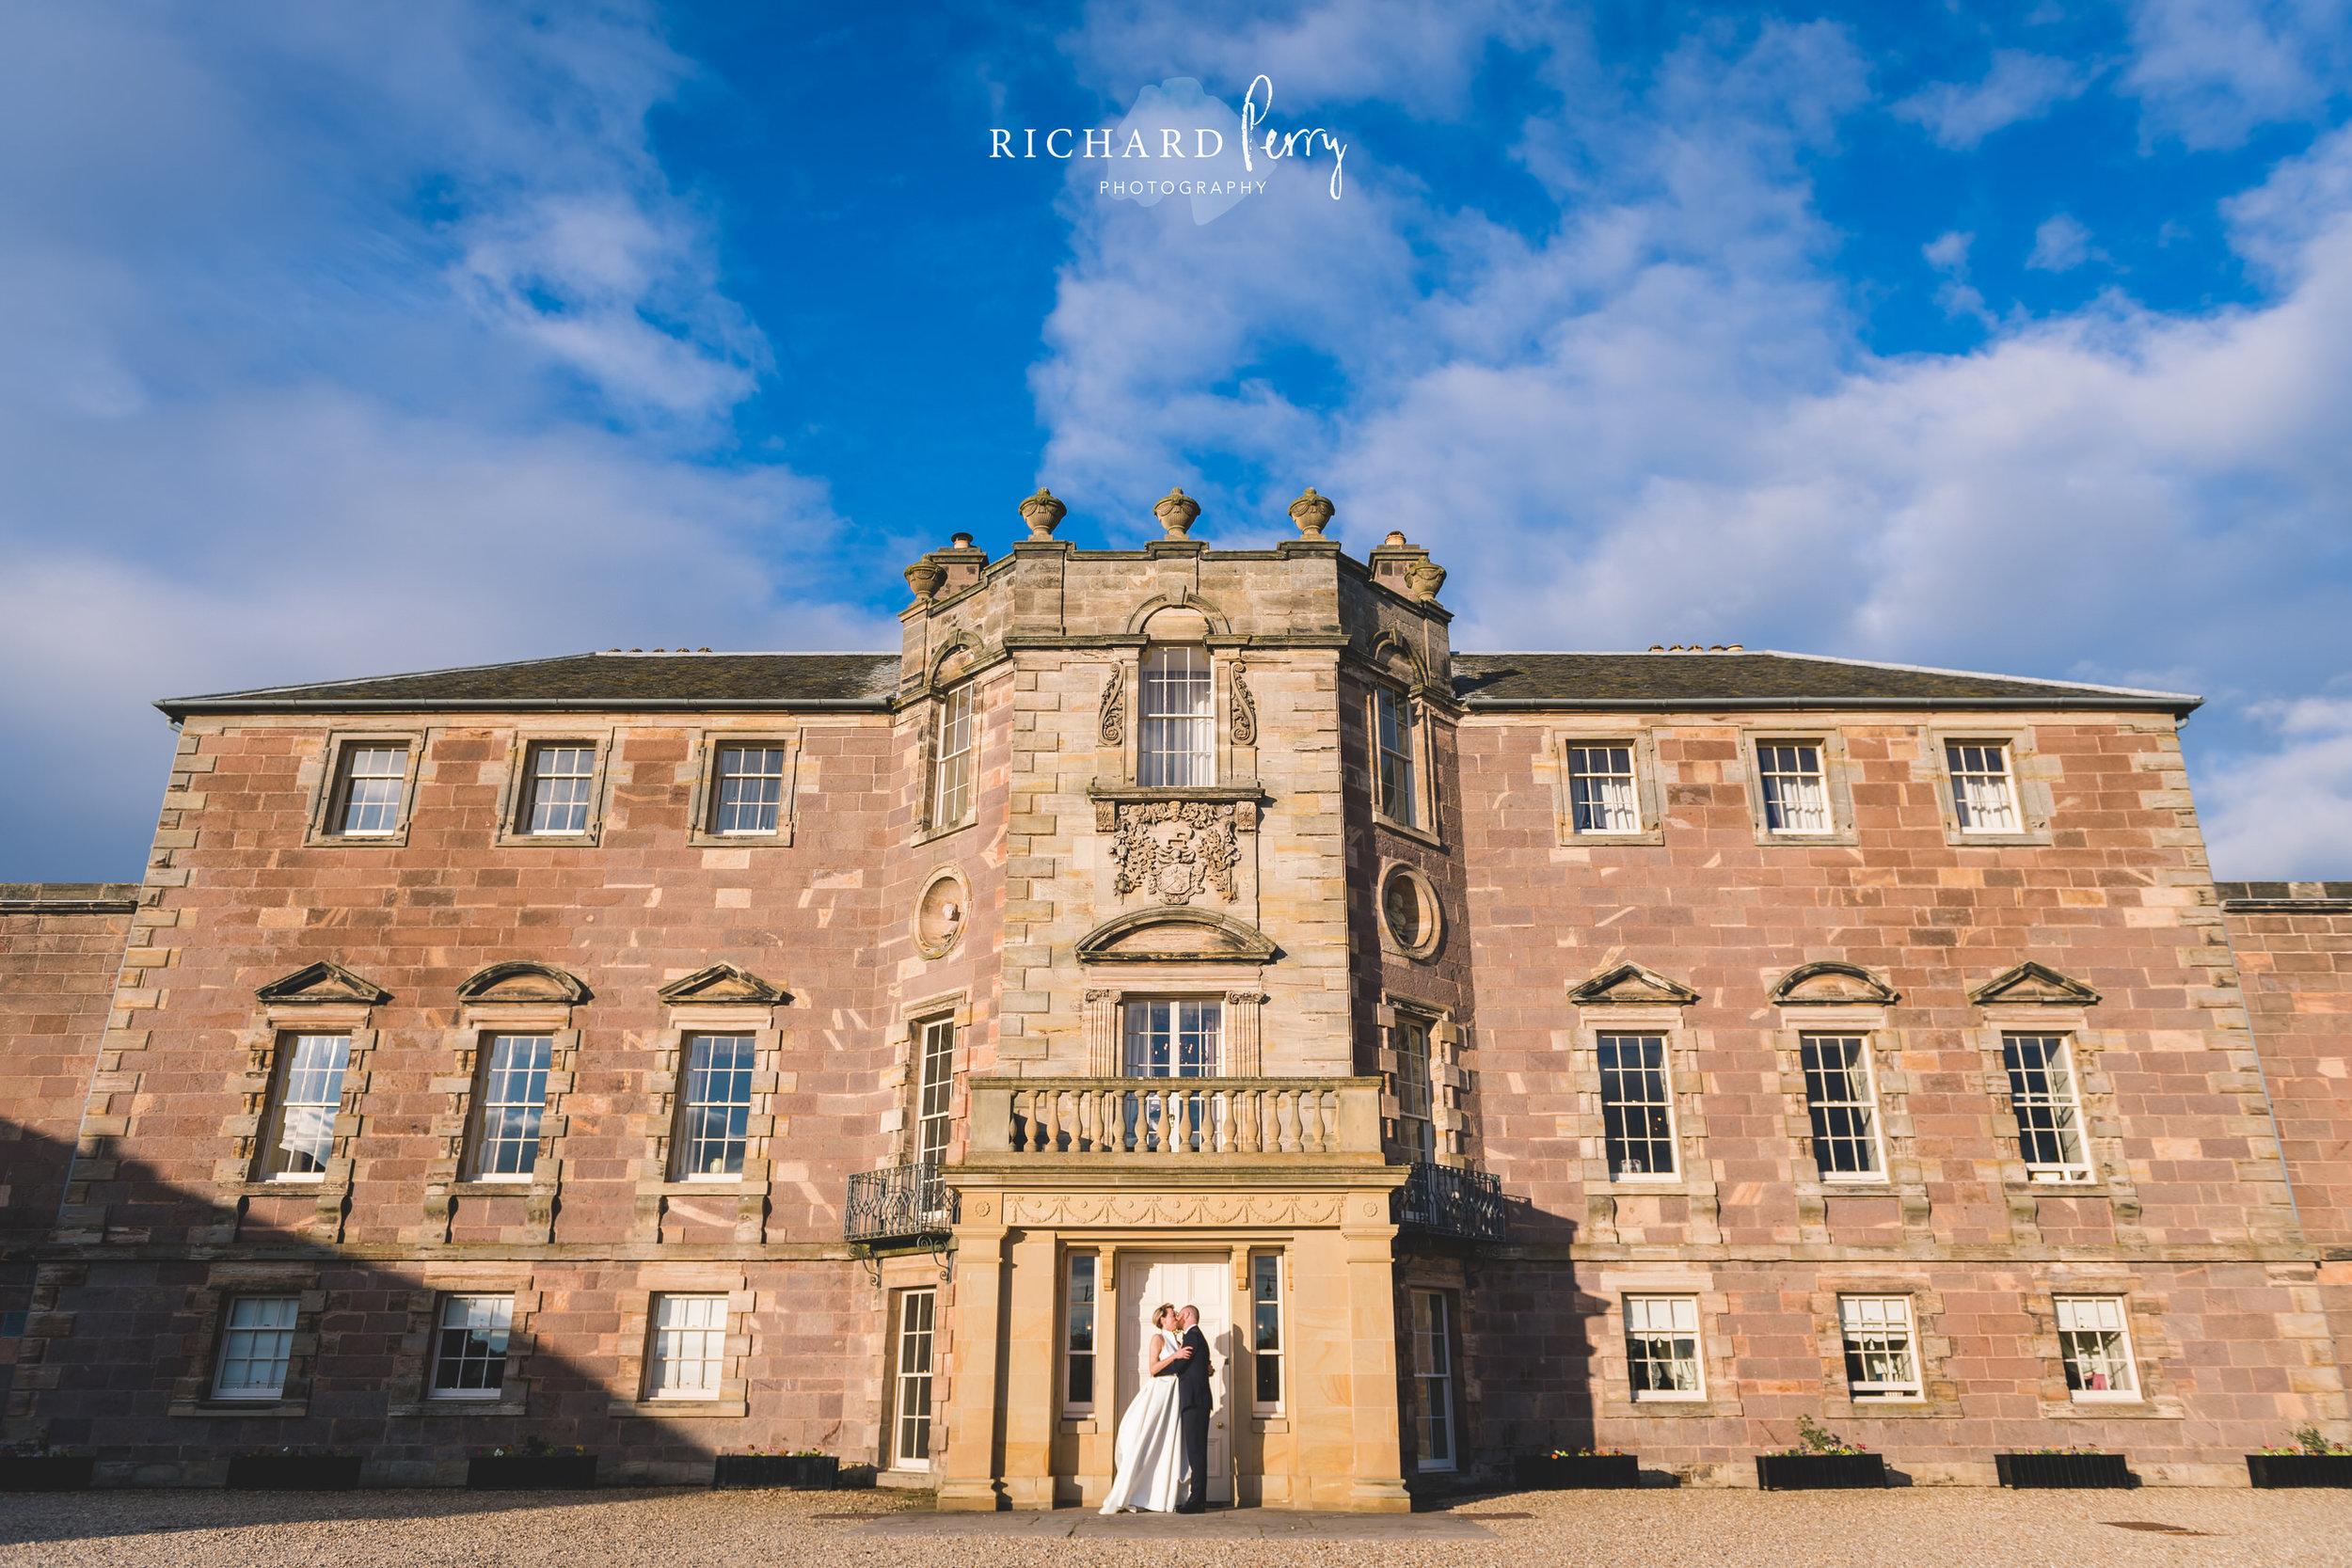 yorkshire-wedding-photographer-destination-archerfield-house-25.jpg